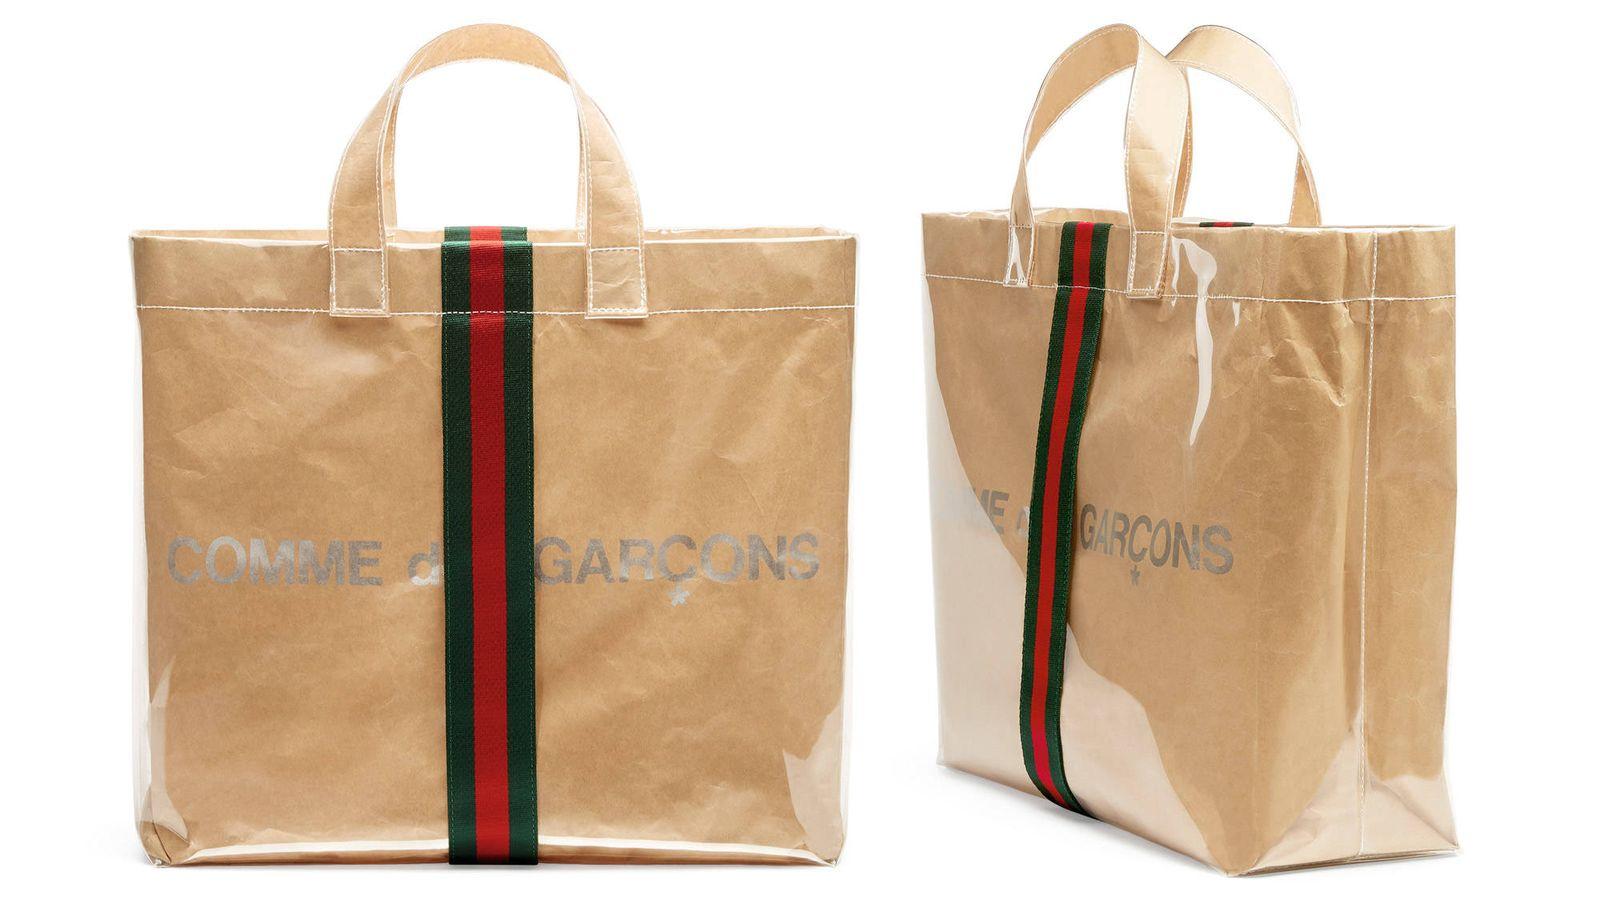 610c1fcda Moda hombre: Gucci colabora con Comme des Garçons y lanza un exclusivo bolso